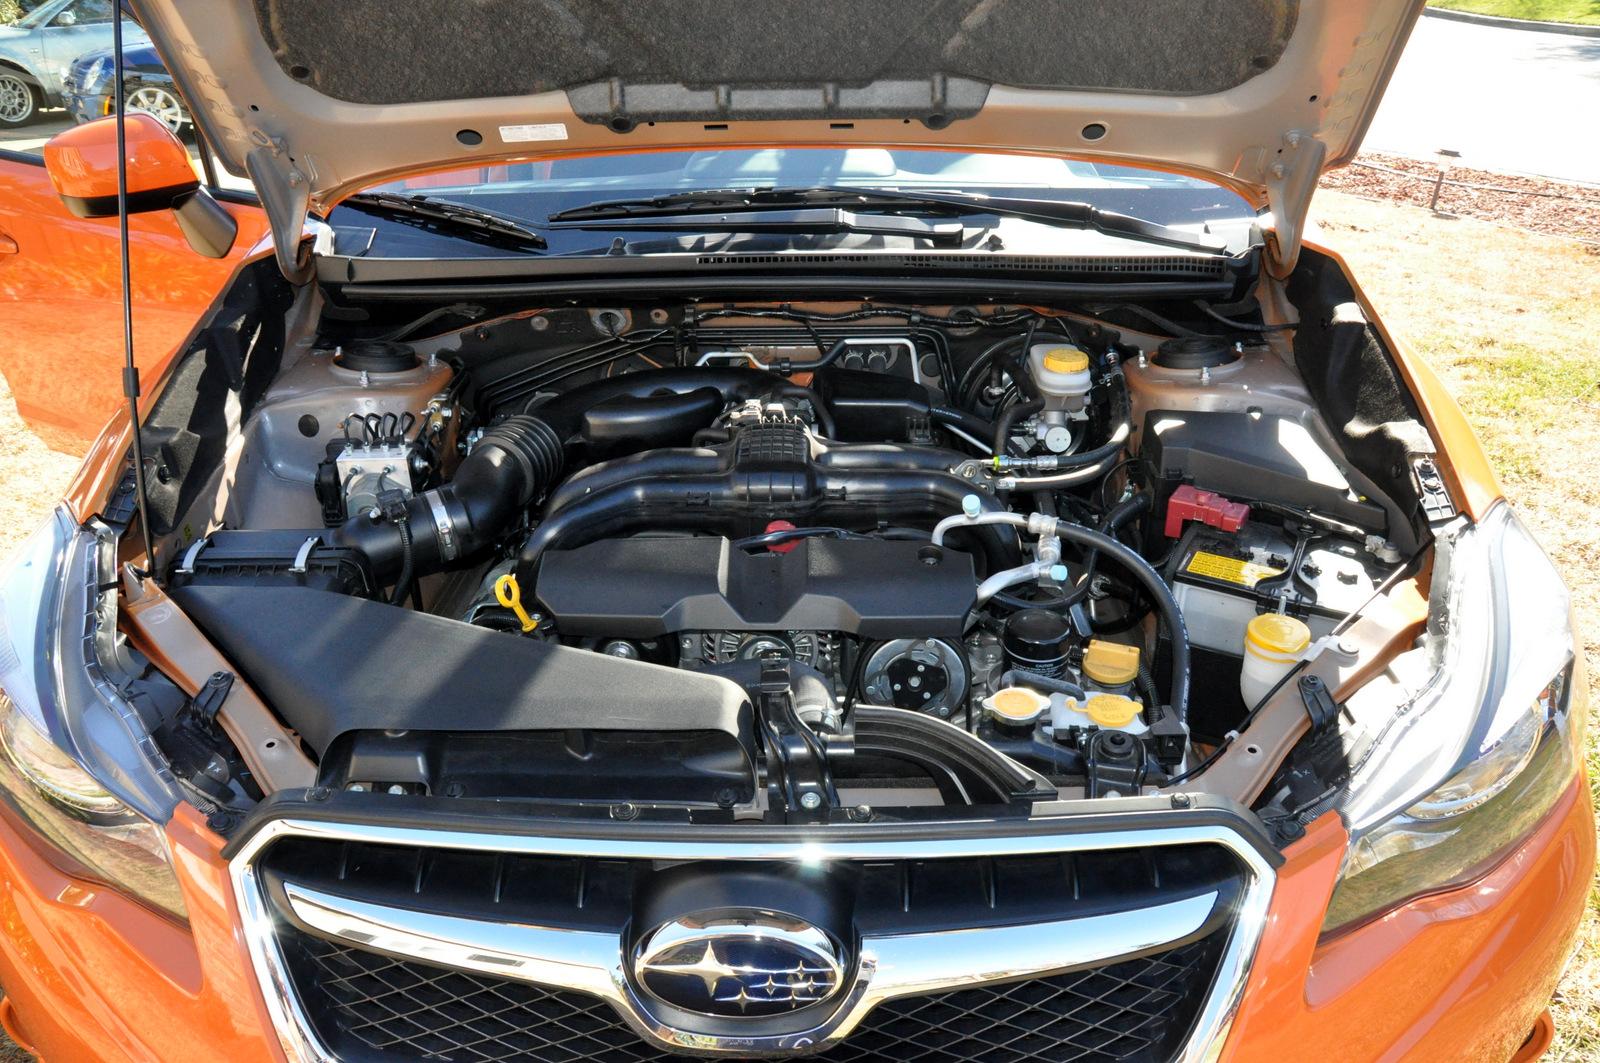 Subaru Xv Crosstrek Engine Front